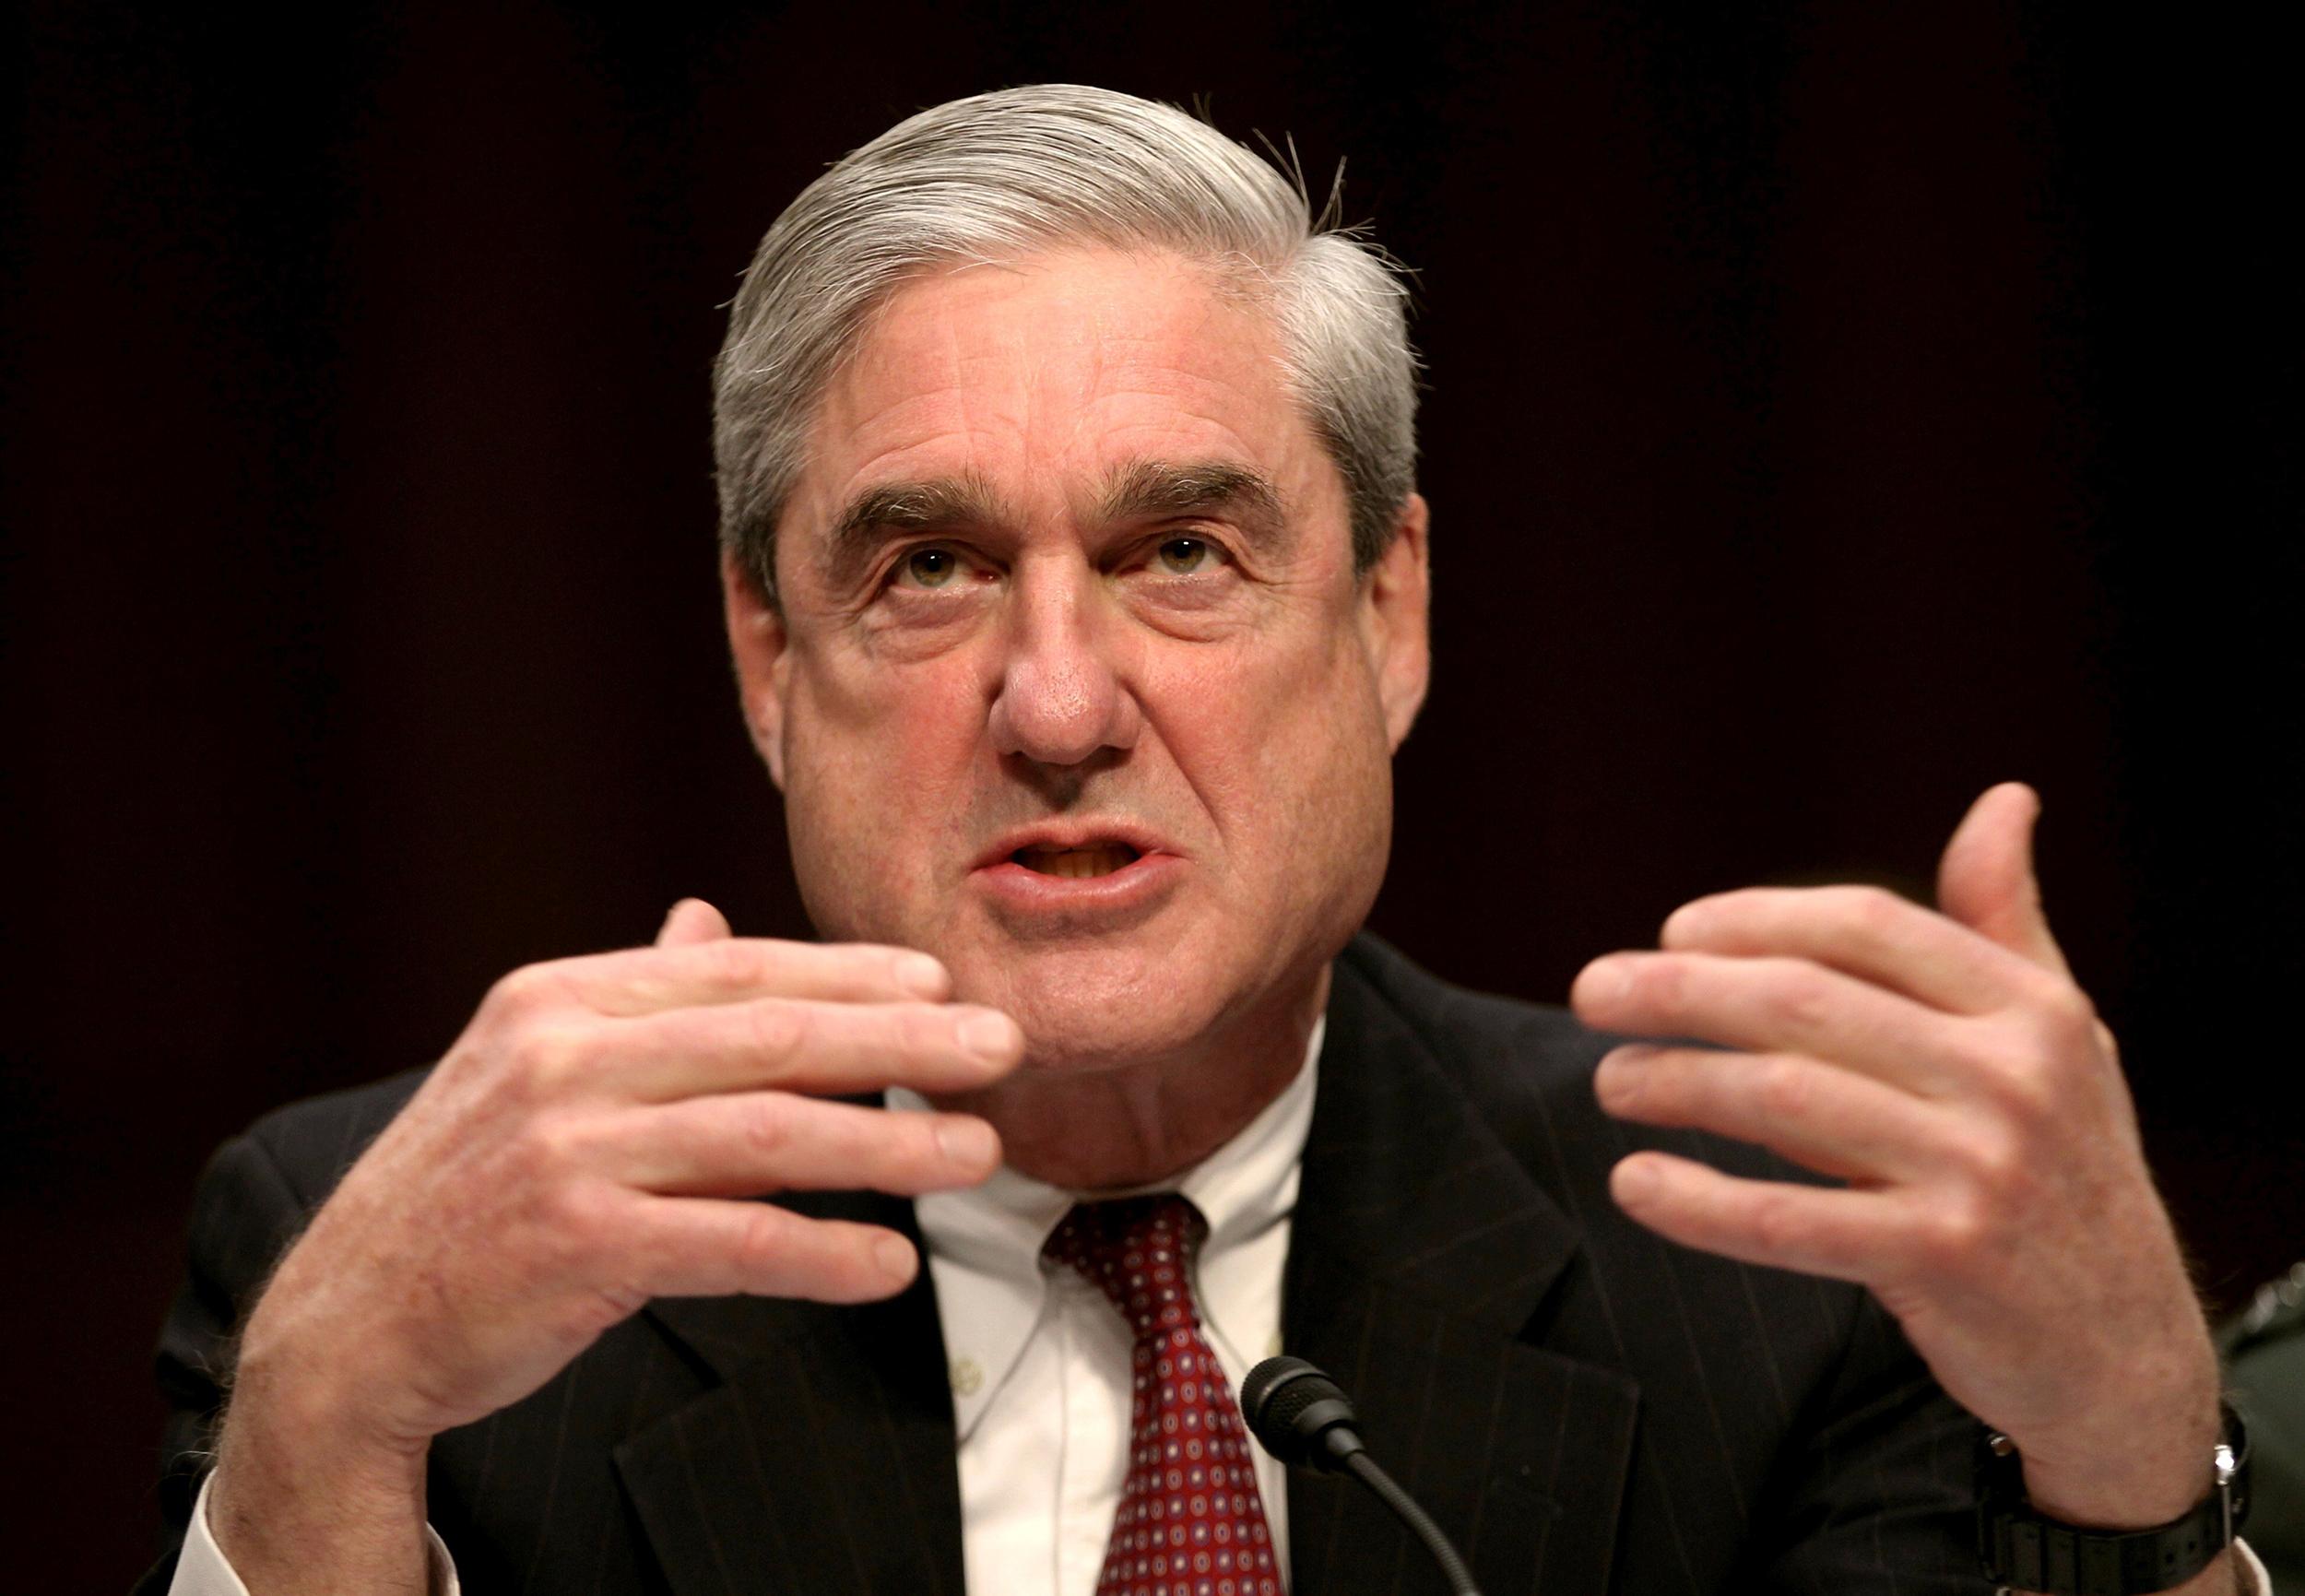 Image: FBI Director Robert Mueller Testifies at a Senate Intelligence Committee hearing on Capitol Hill